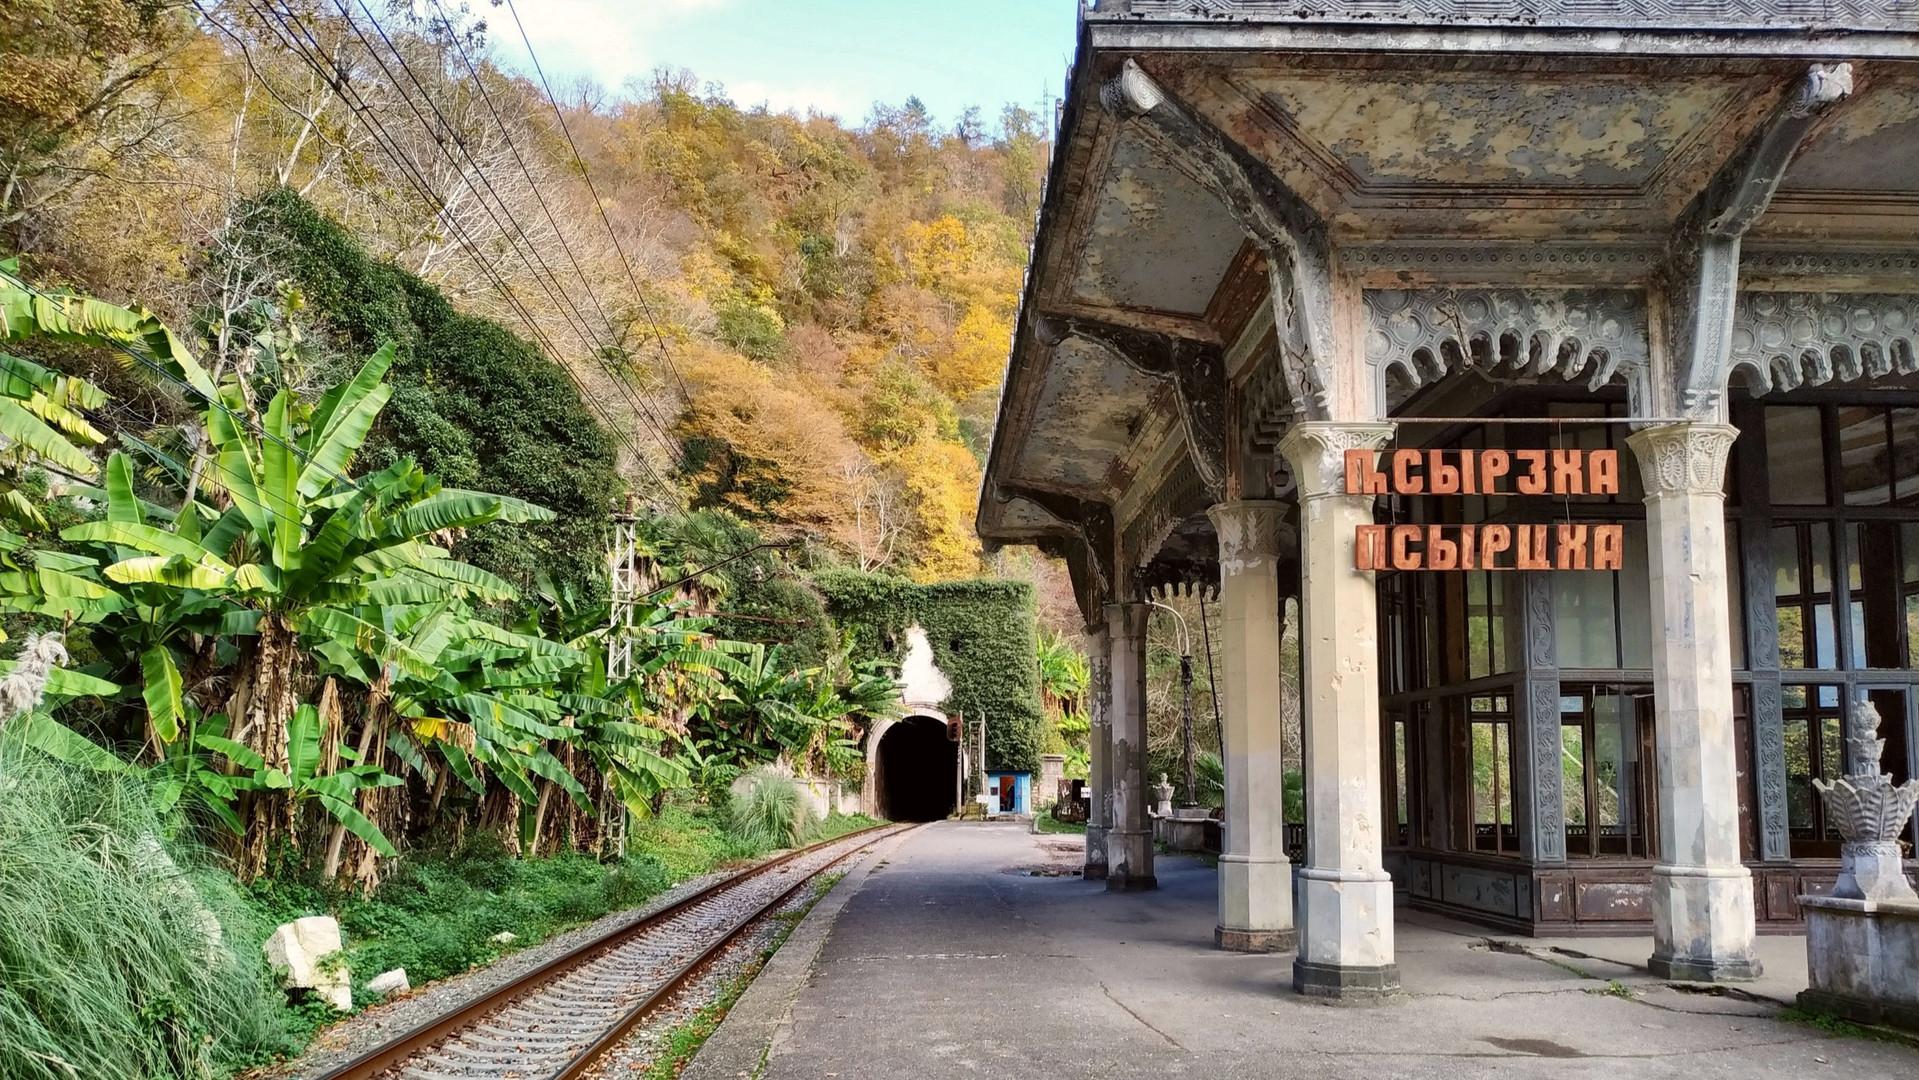 Psyrzkha abended train station, Abkhazia